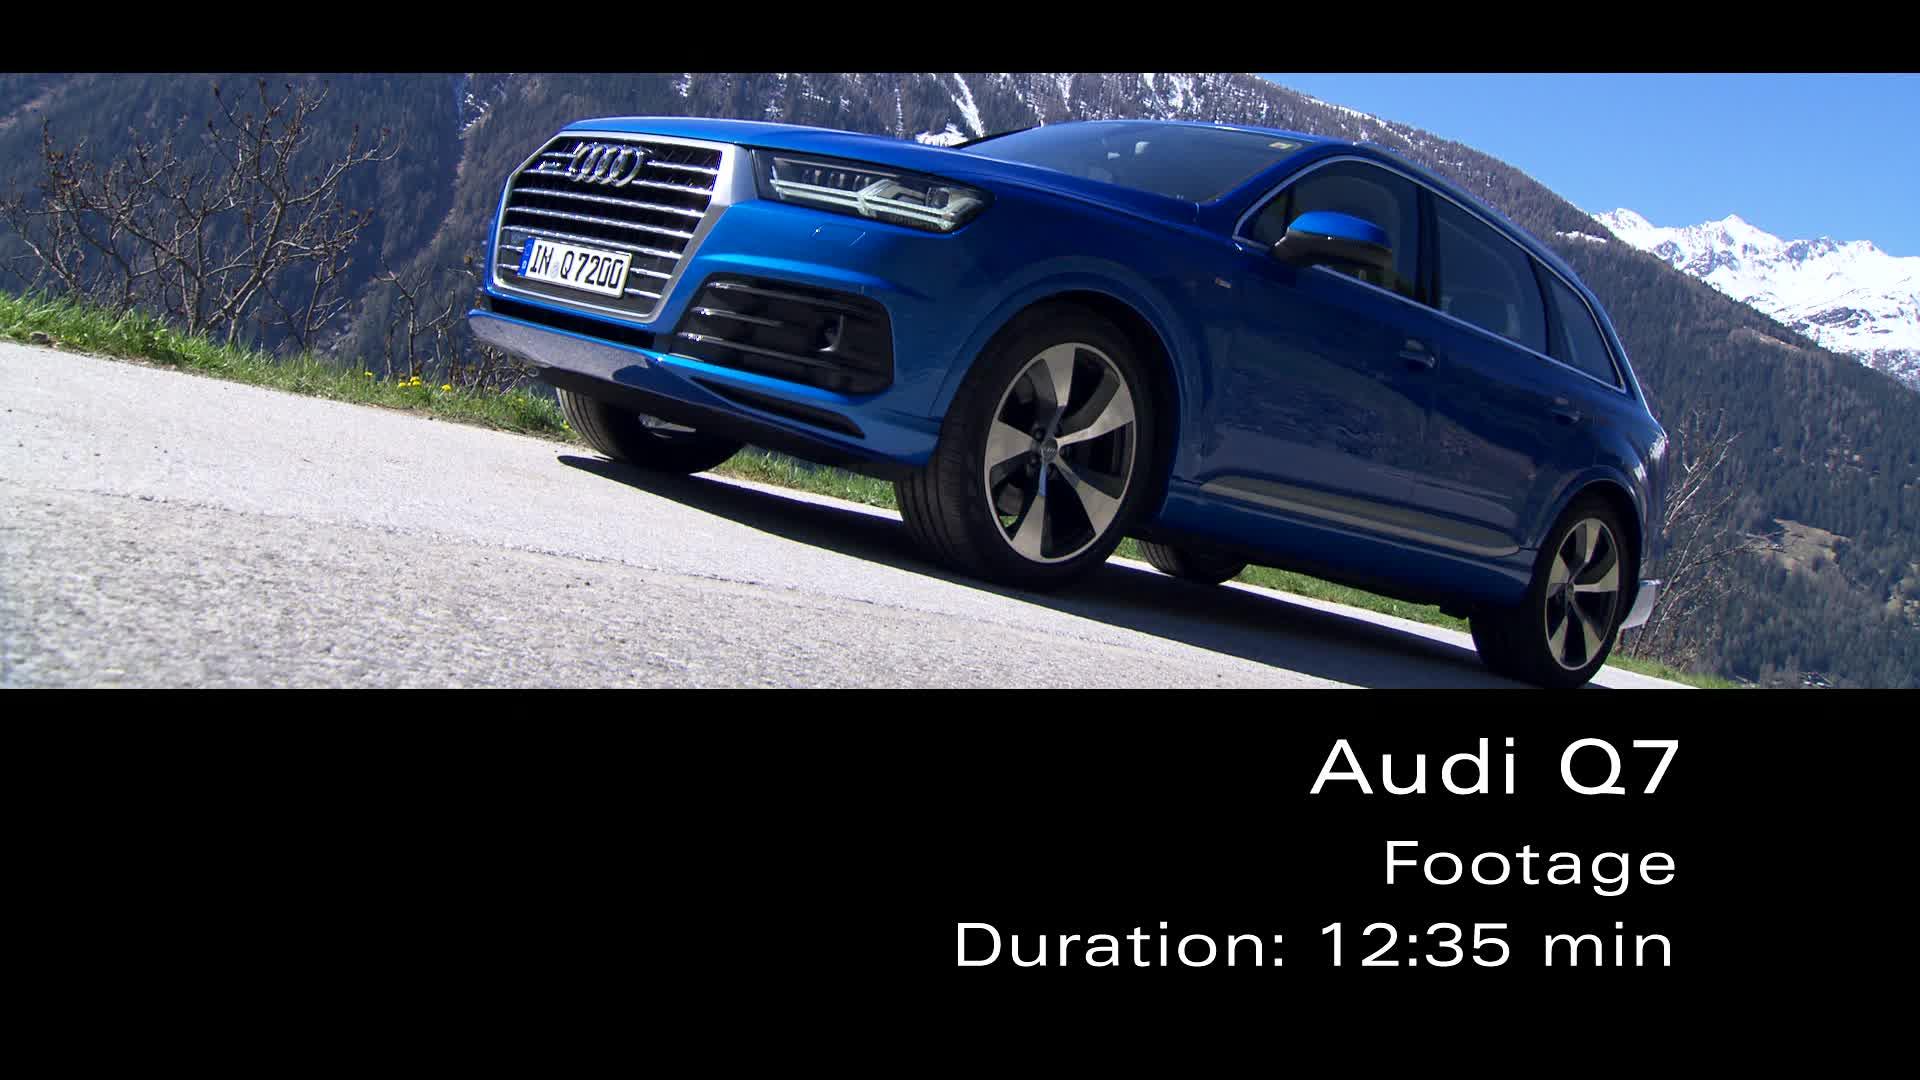 Audi Q7 - Footage Alps